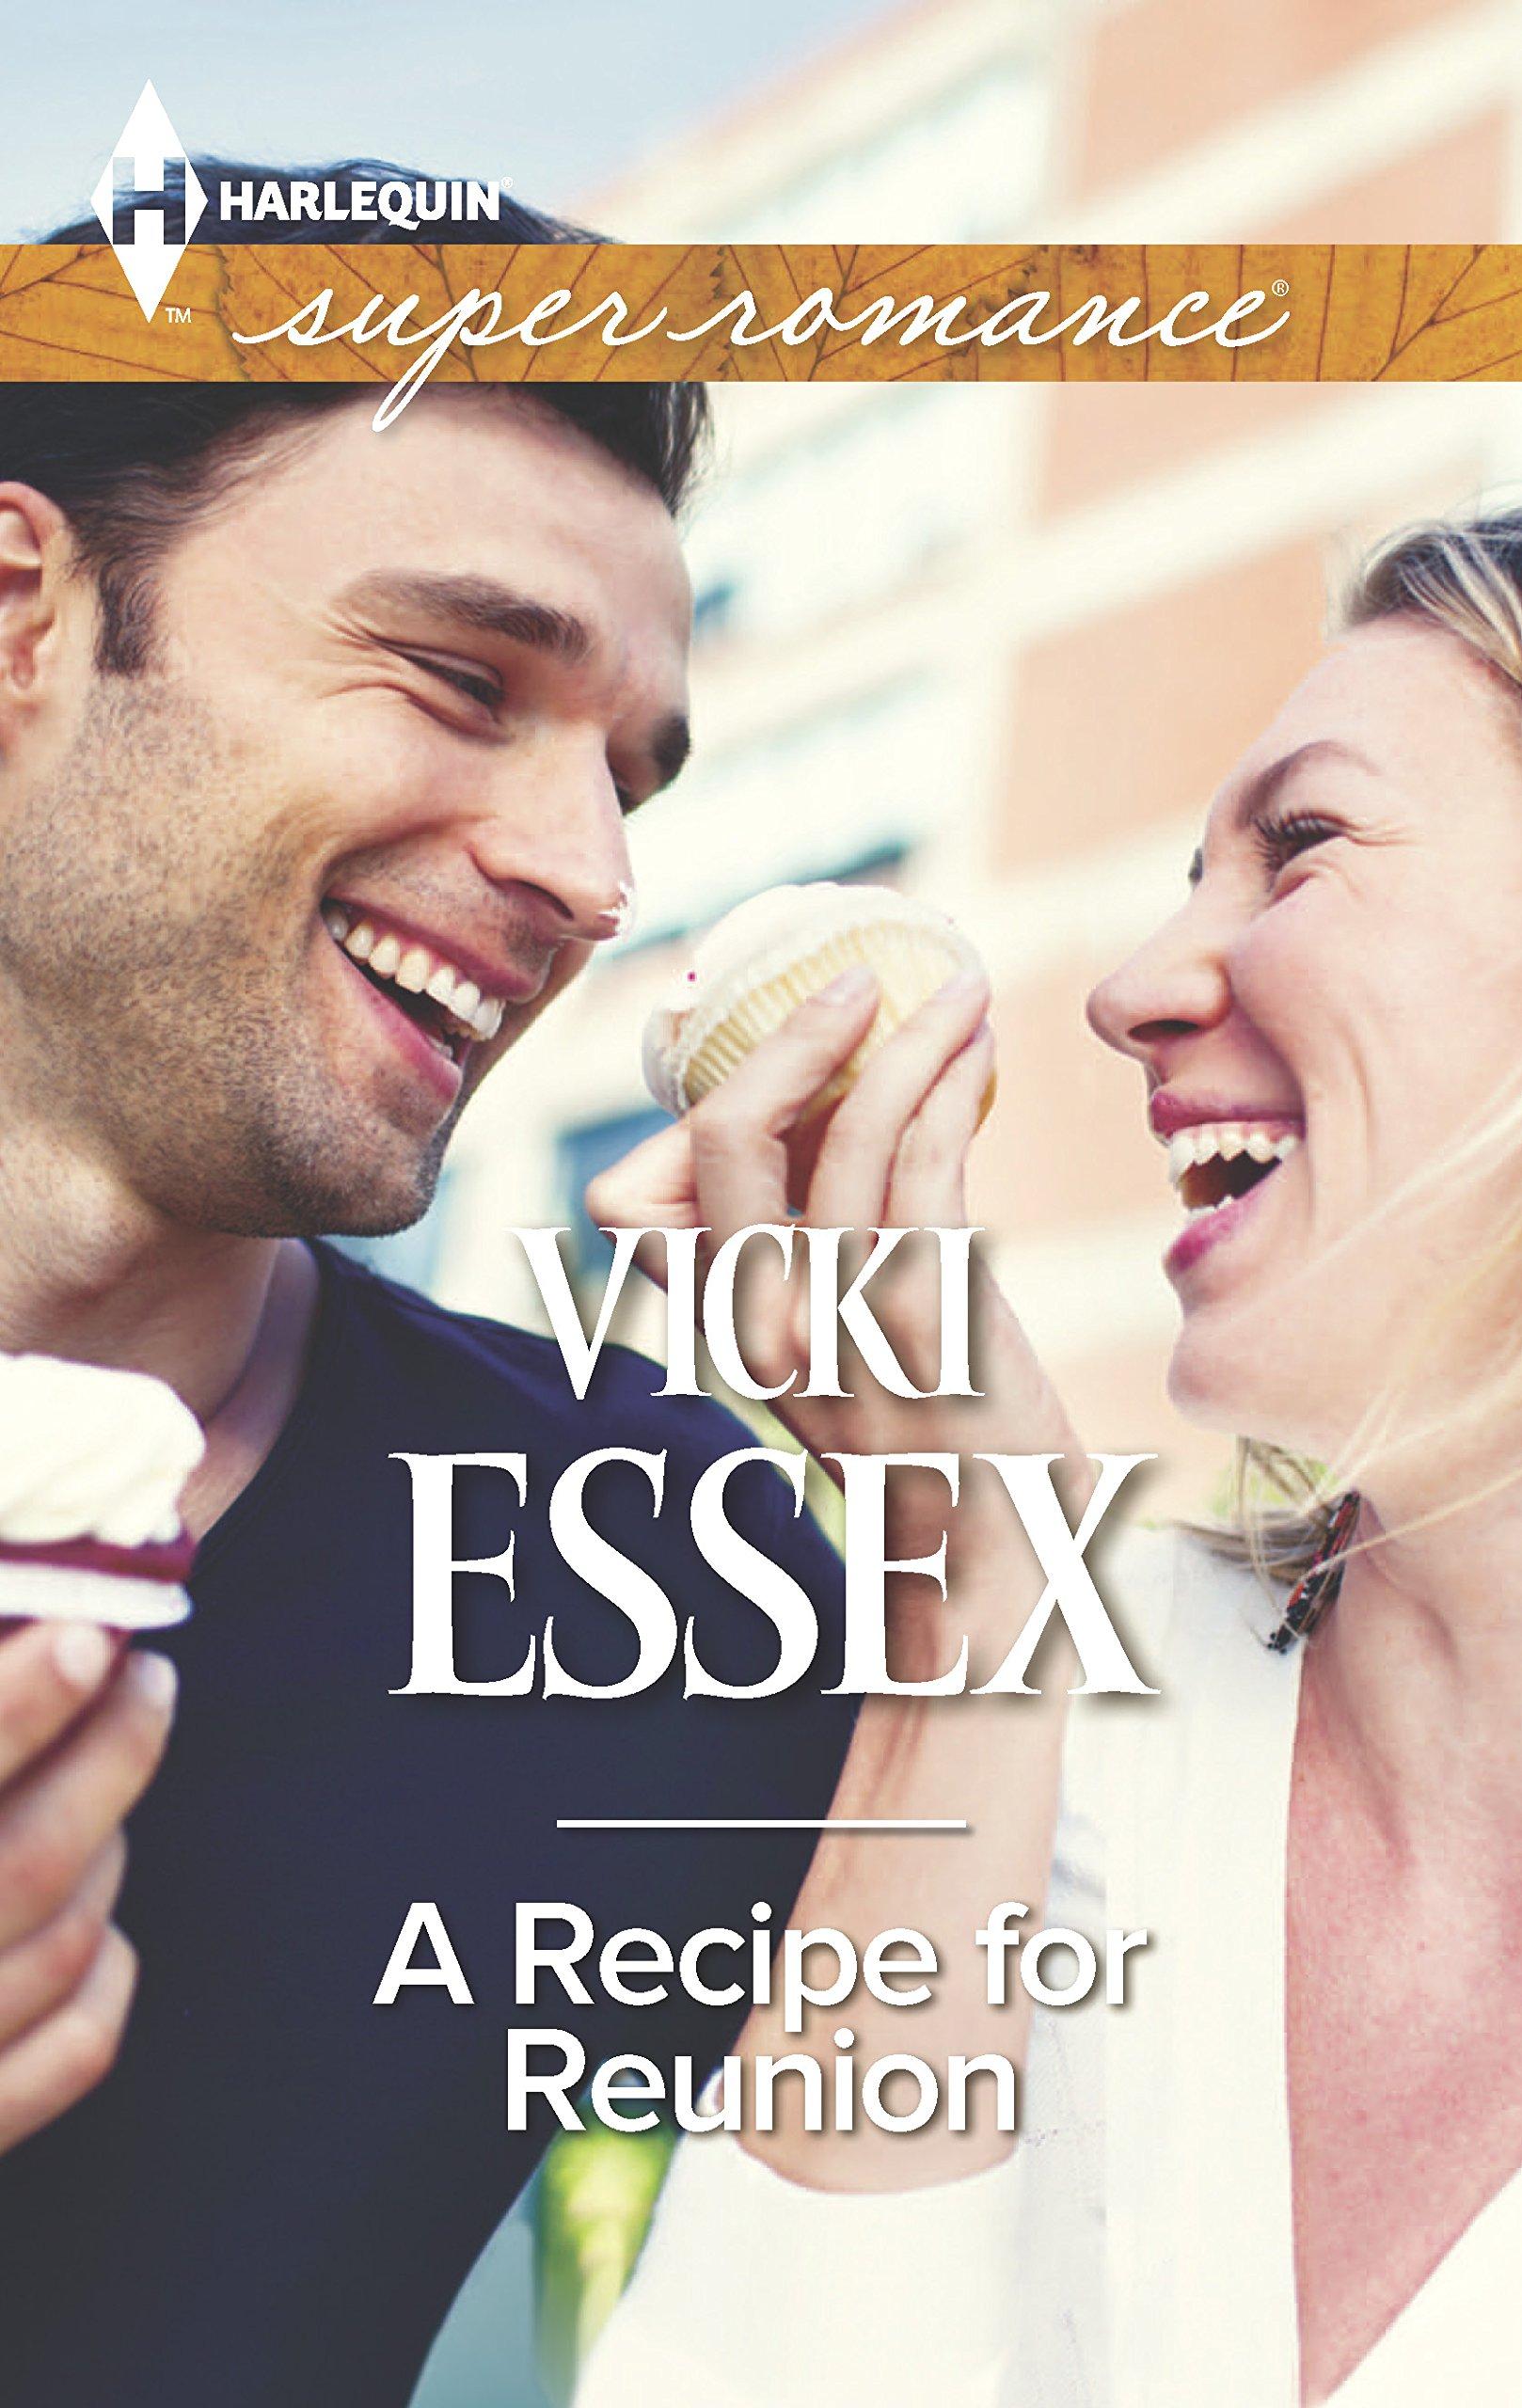 Read Online A Recipe for Reunion (Harlequin Super Romance) ebook